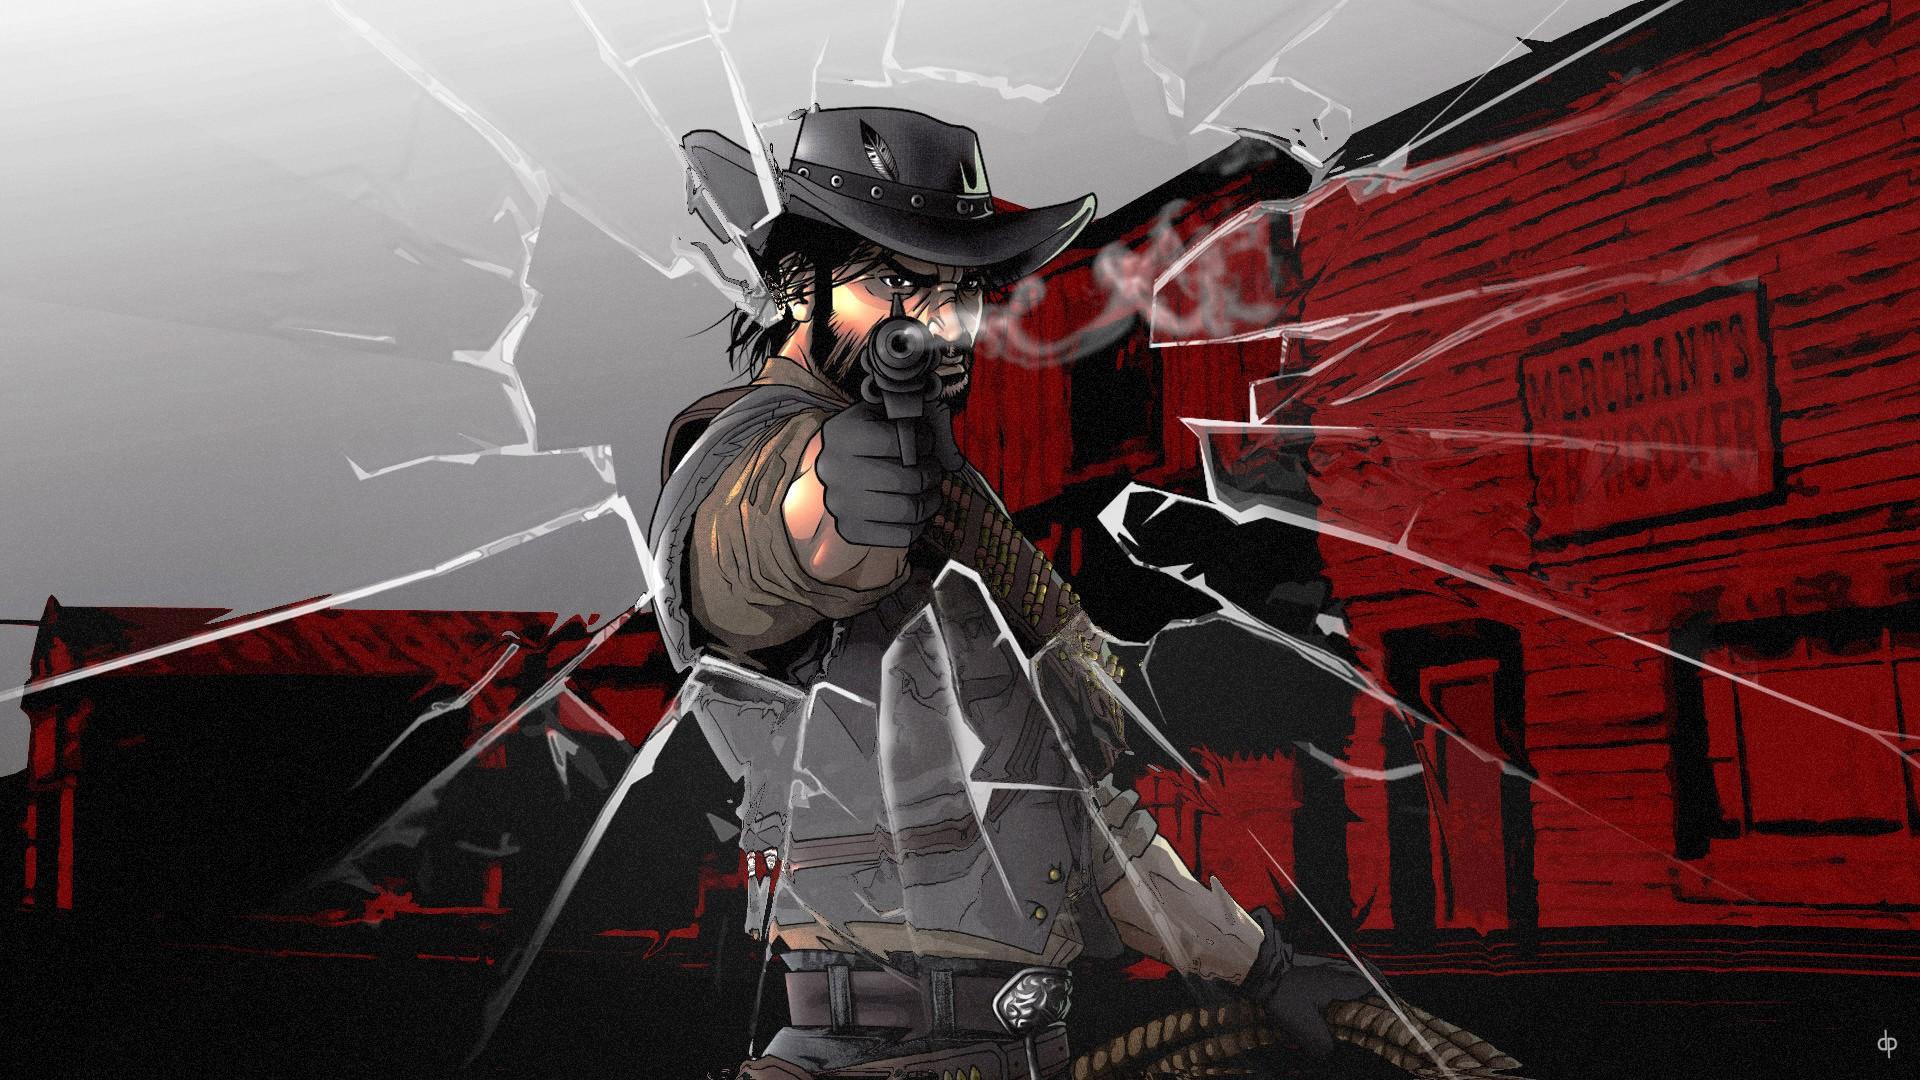 Wallpaper Red Dead Redemption Darkness Screenshot 1920x1080 Px 1920x1080 4kwallpaper 546937 Hd Wallpapers Wallhere